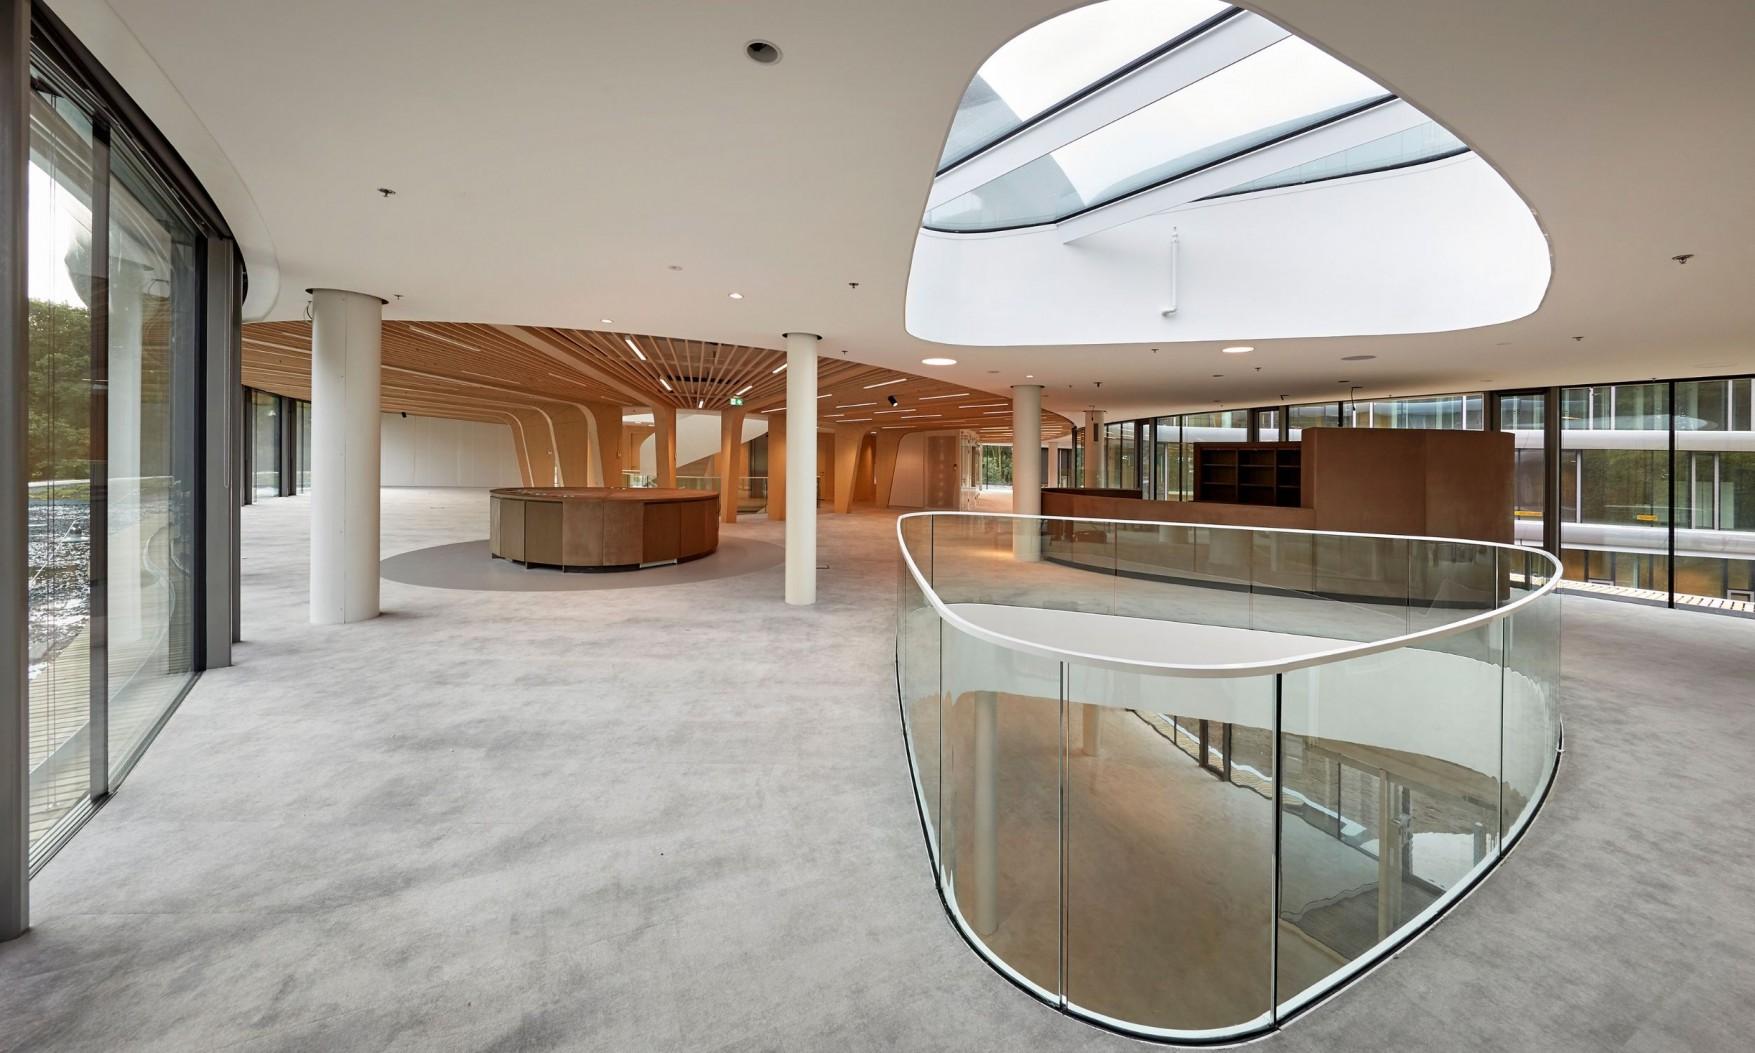 Harryvan Interieurbouw | specials plafond en wandbekleding (Triodos Bank Driebergen)